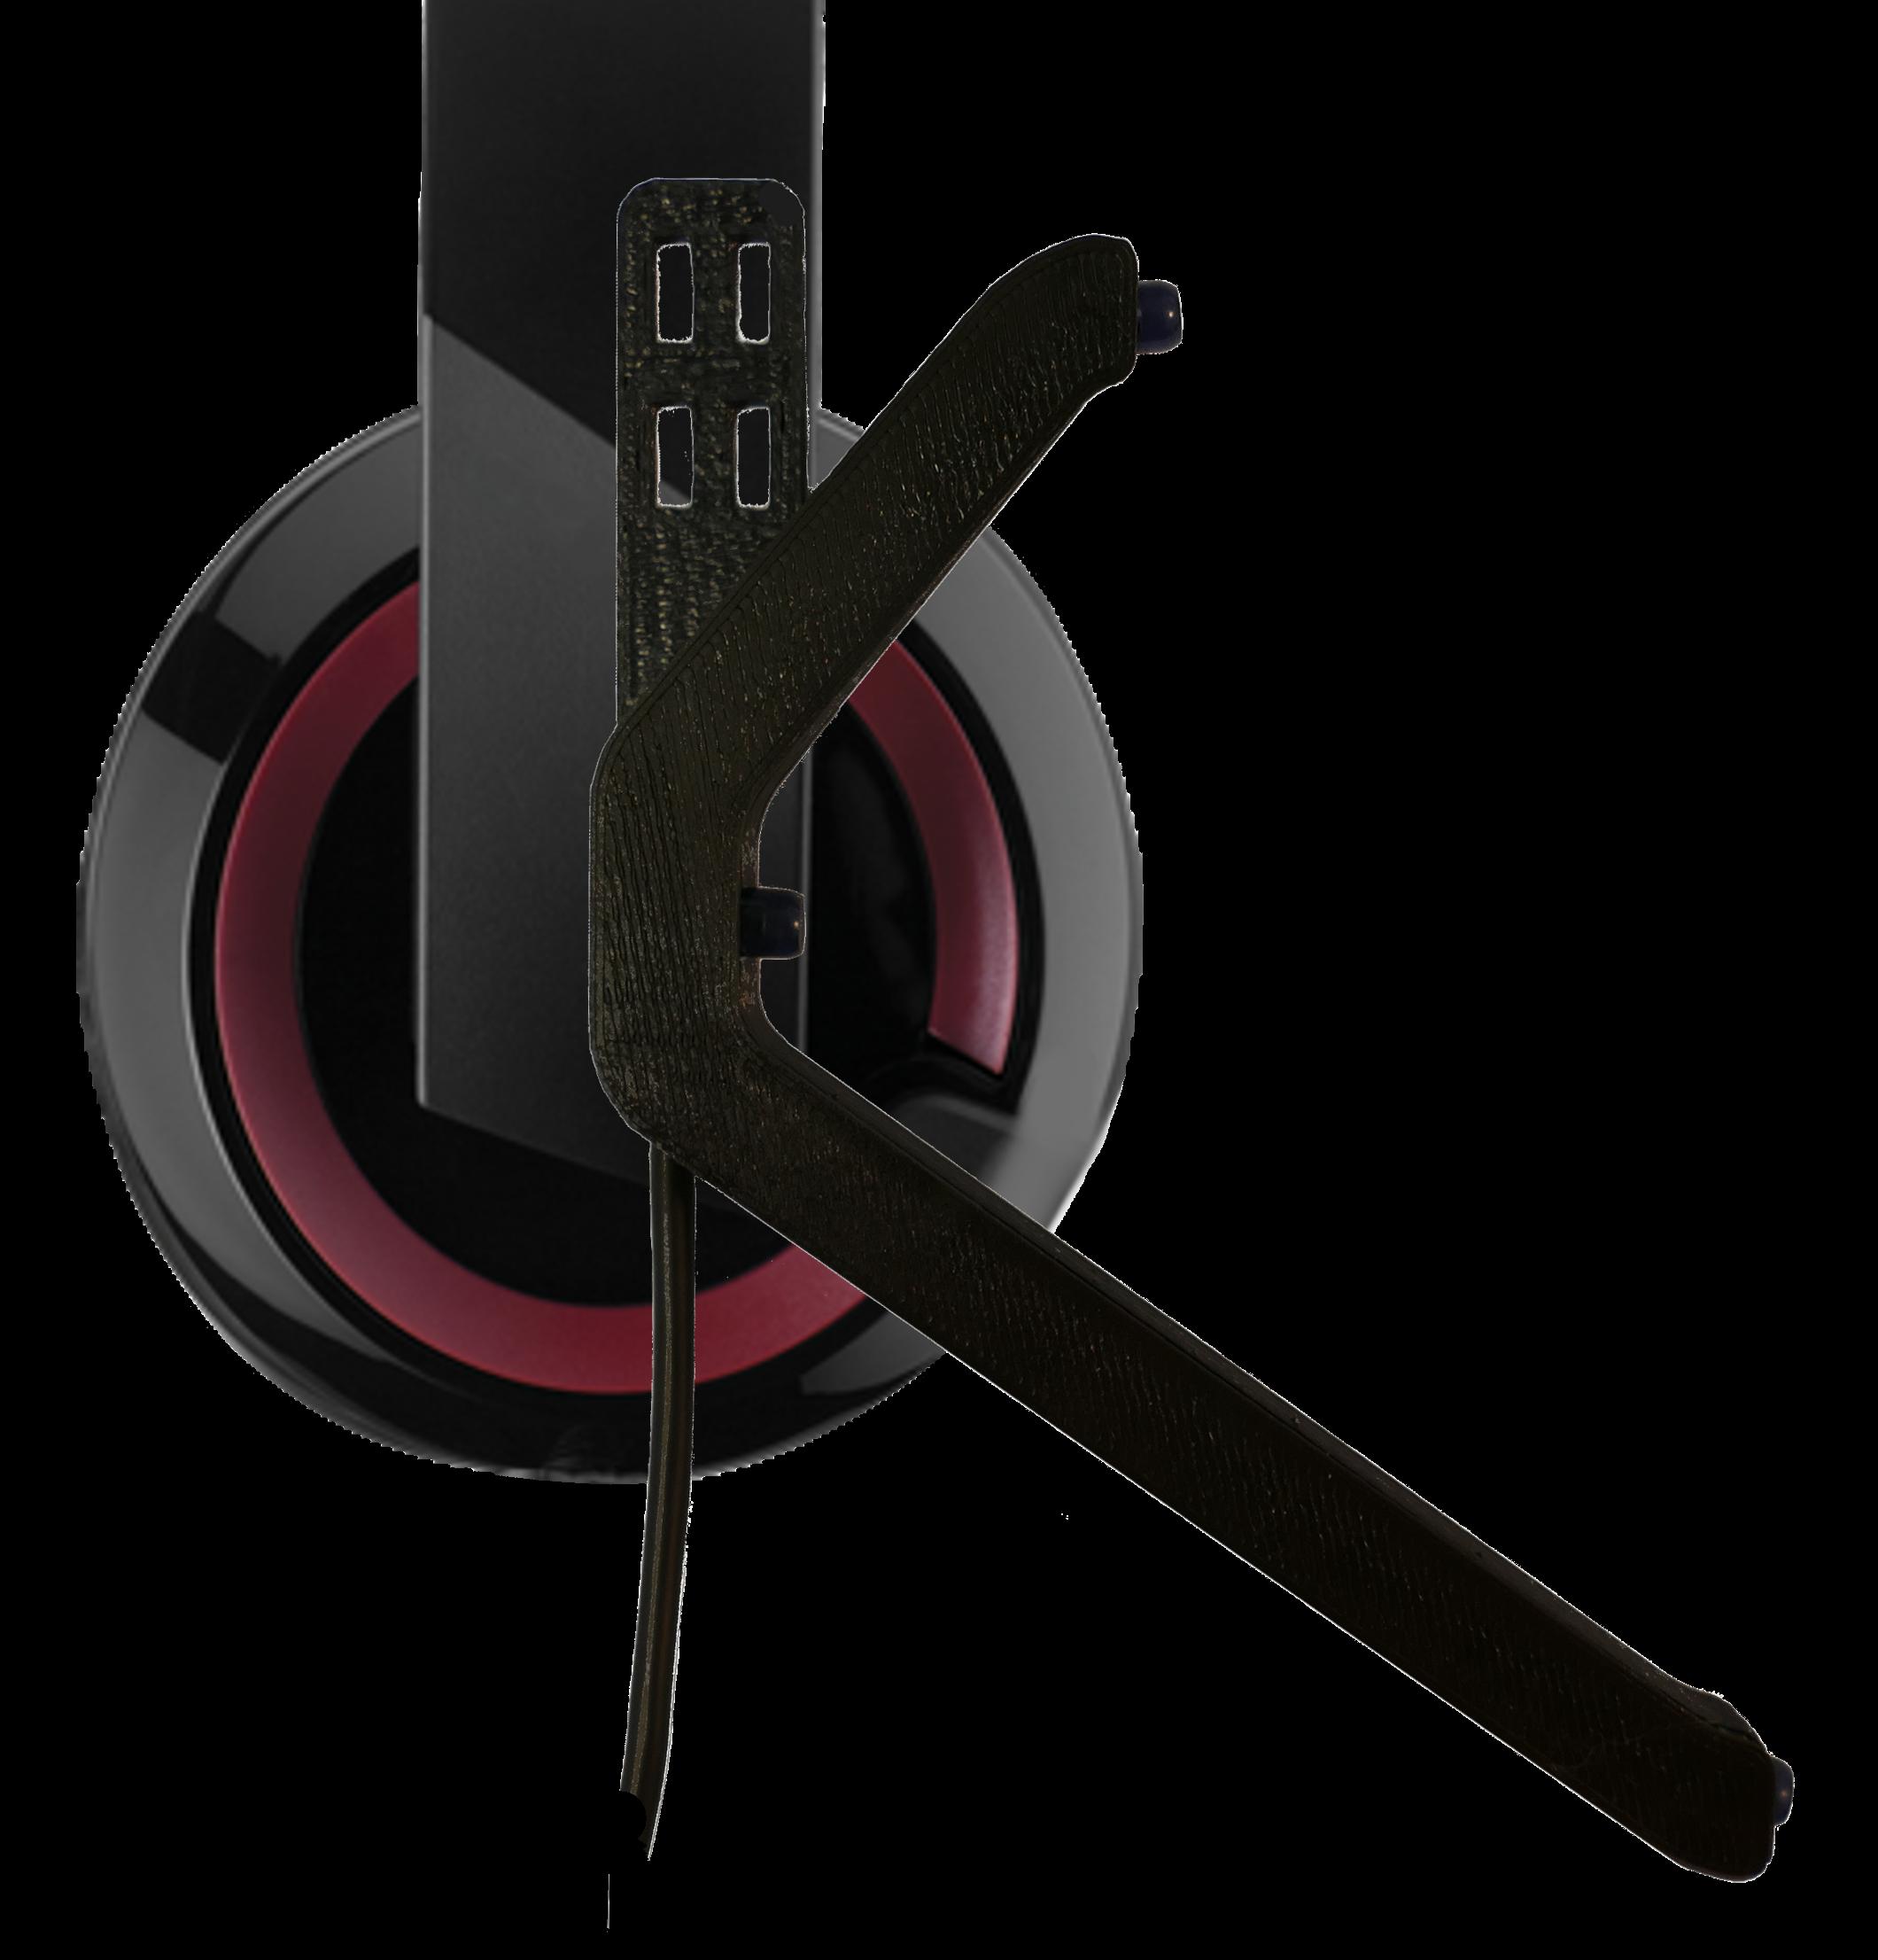 Trackhat Clip